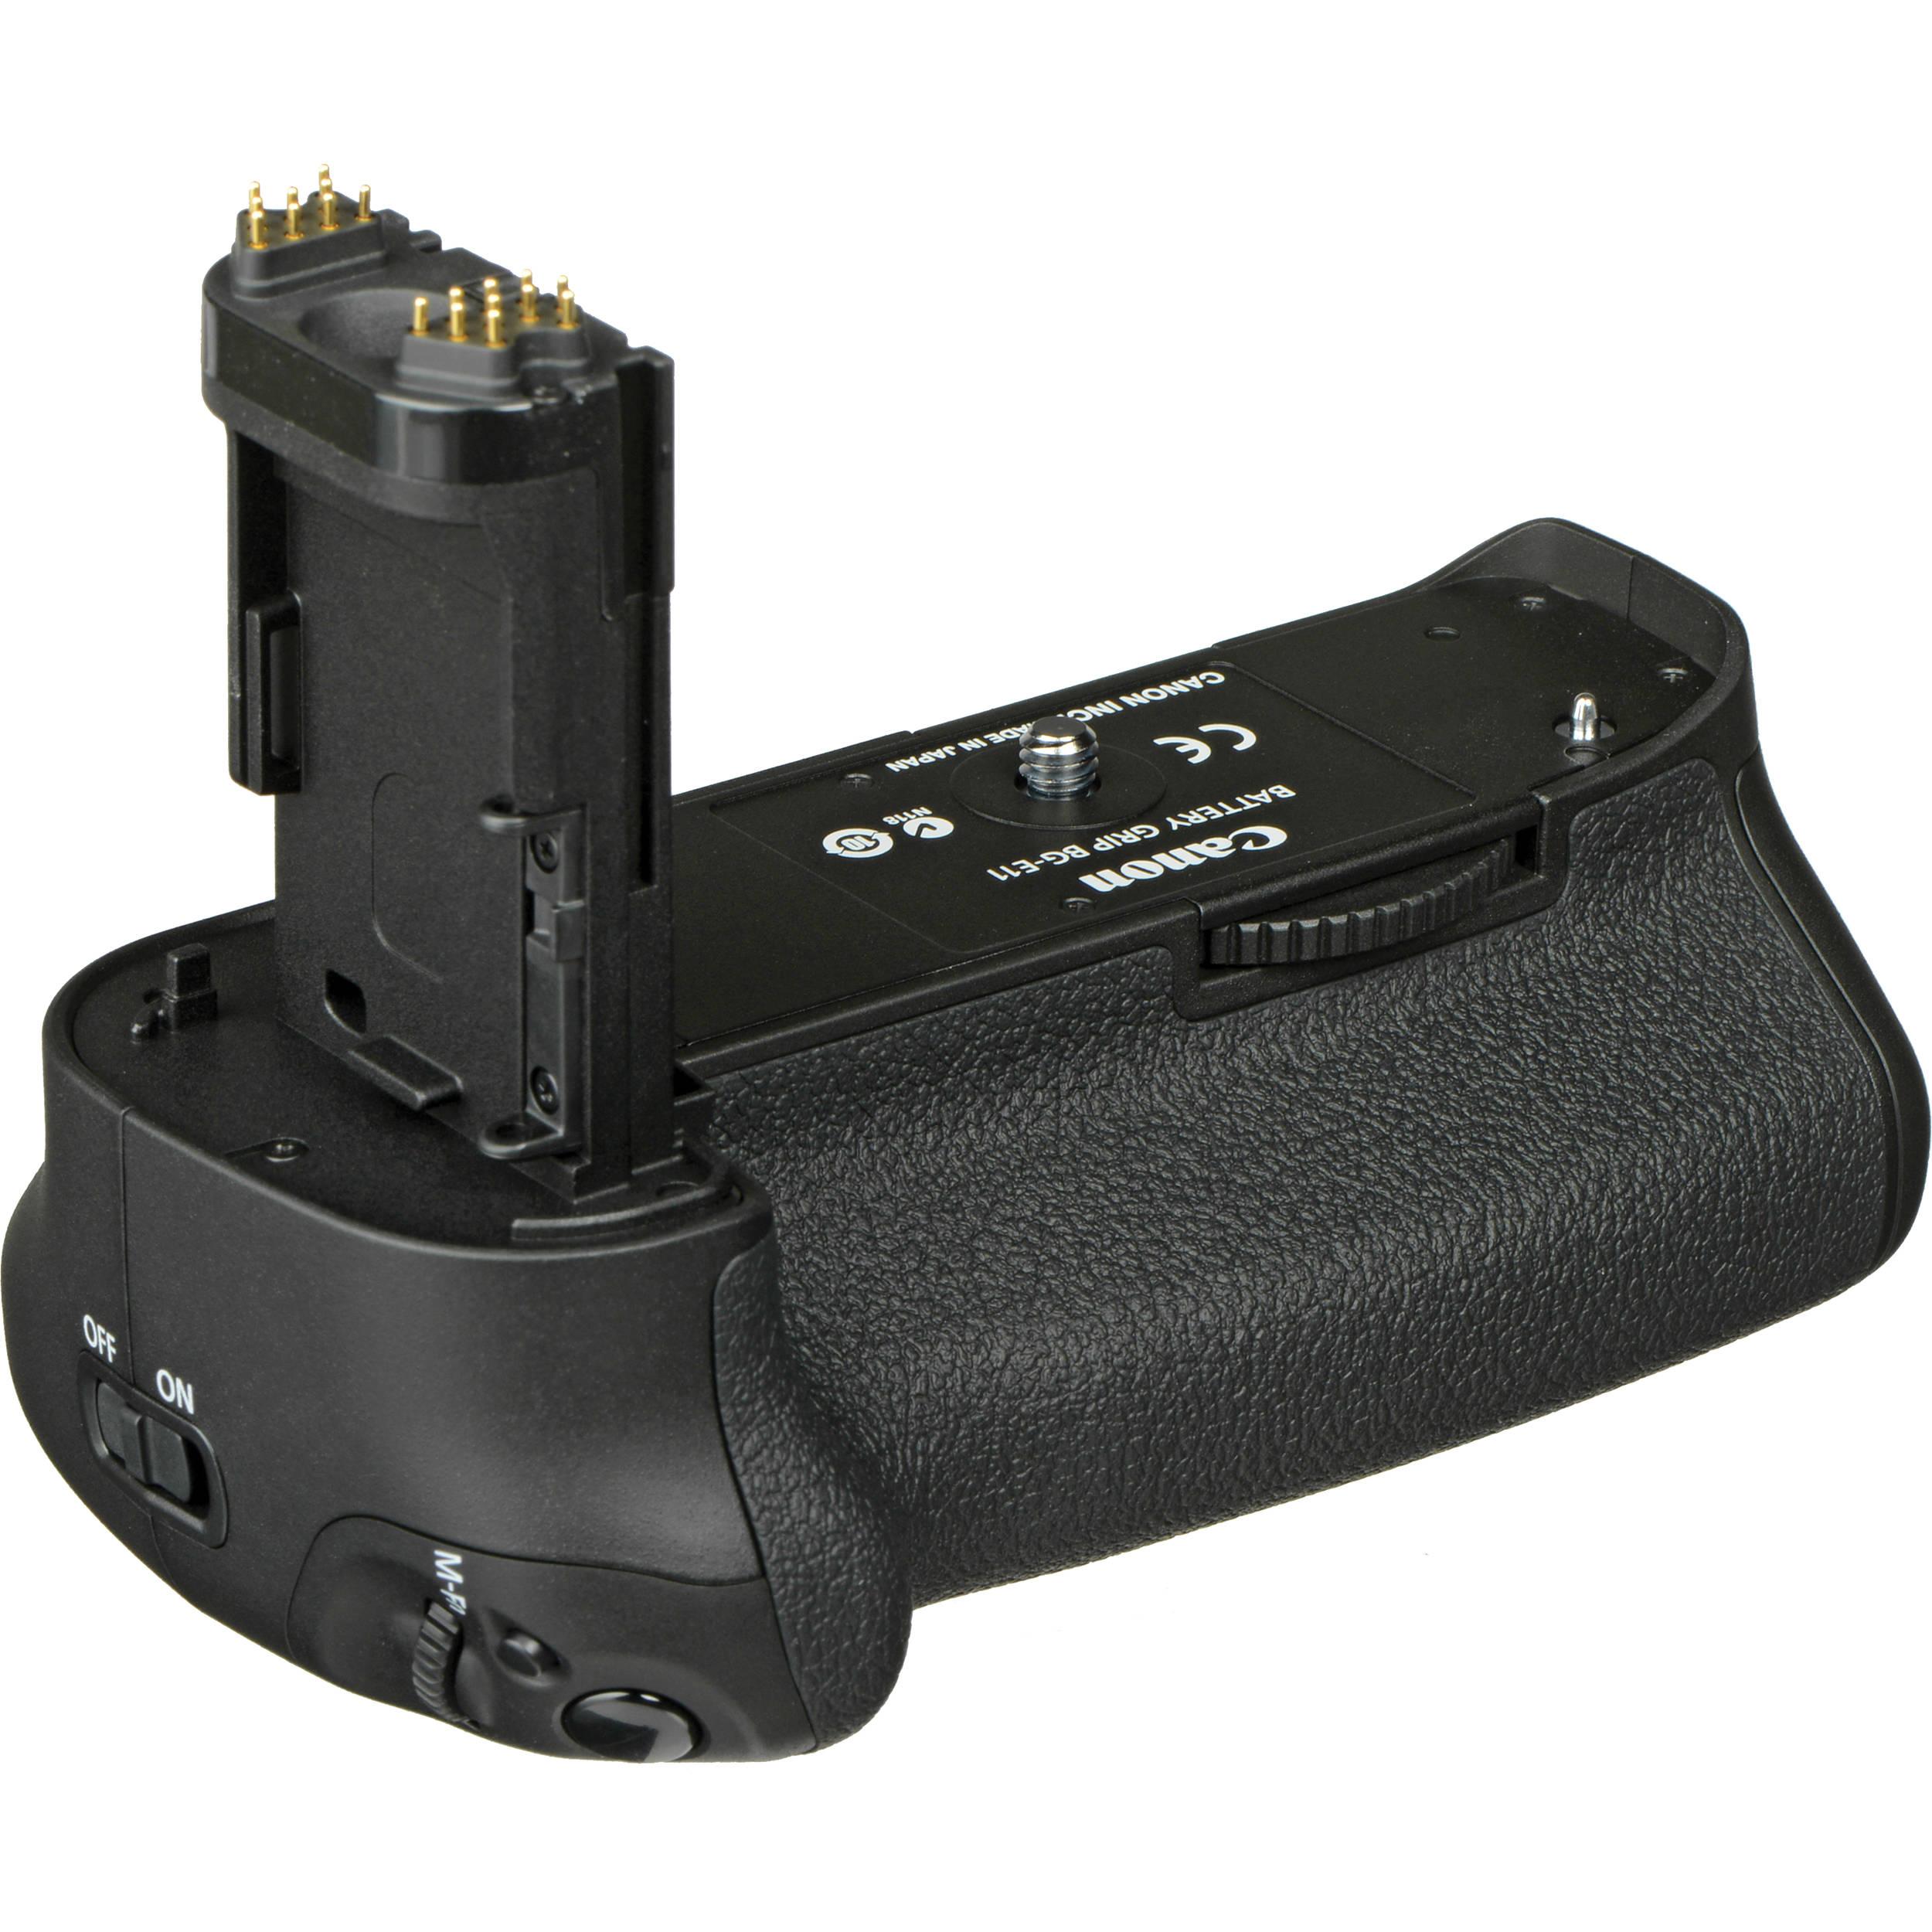 Designed for the Canon EOS 60D SLR Camera